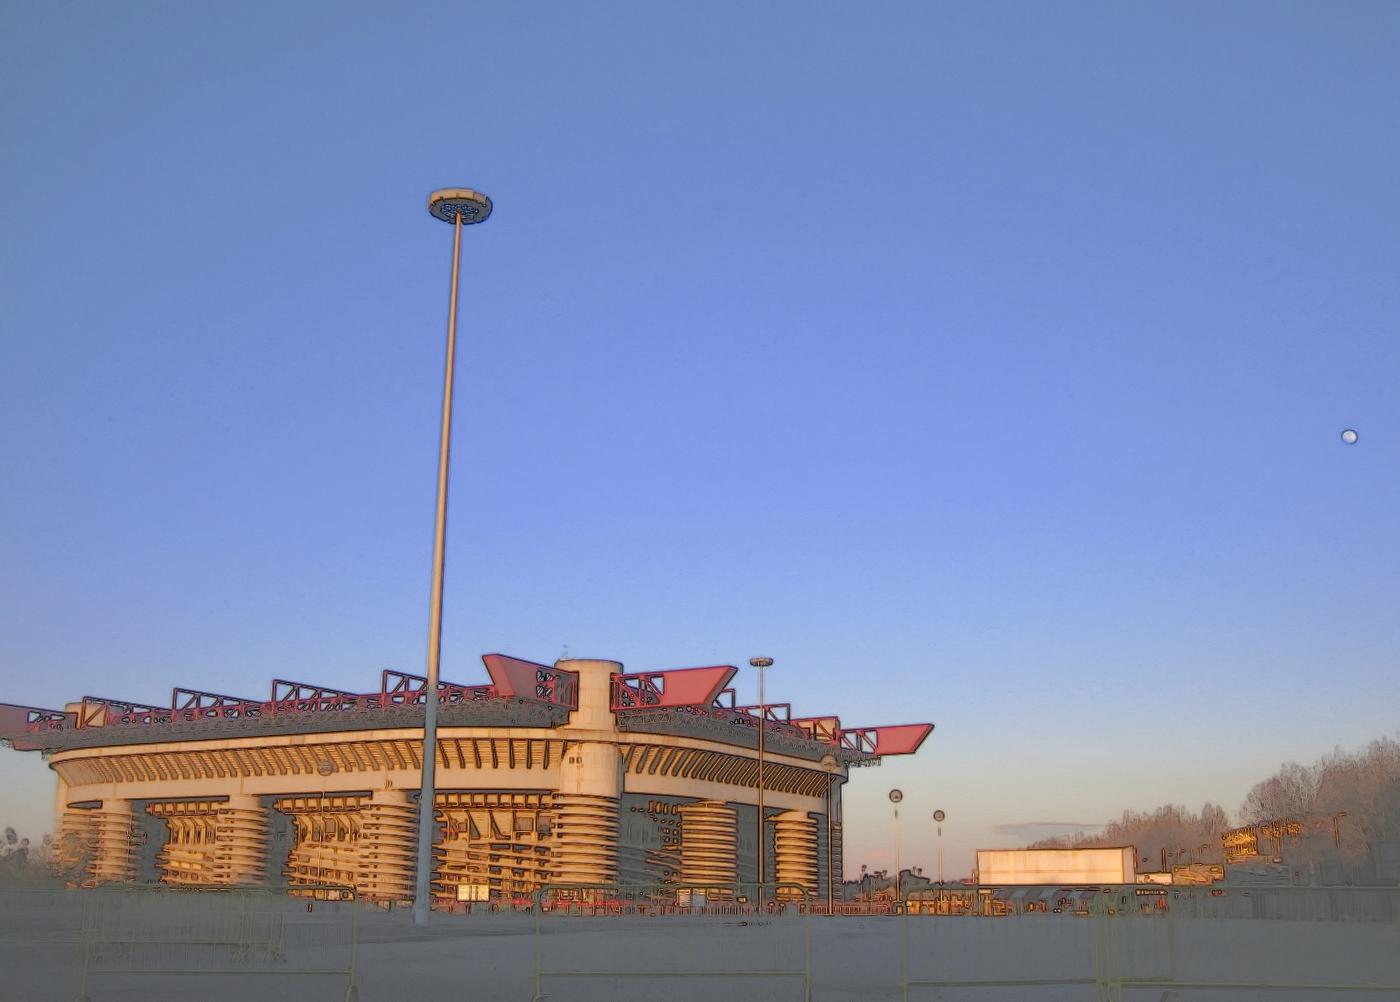 Stadio_San_Siro_-_Giuseppe_.jpg